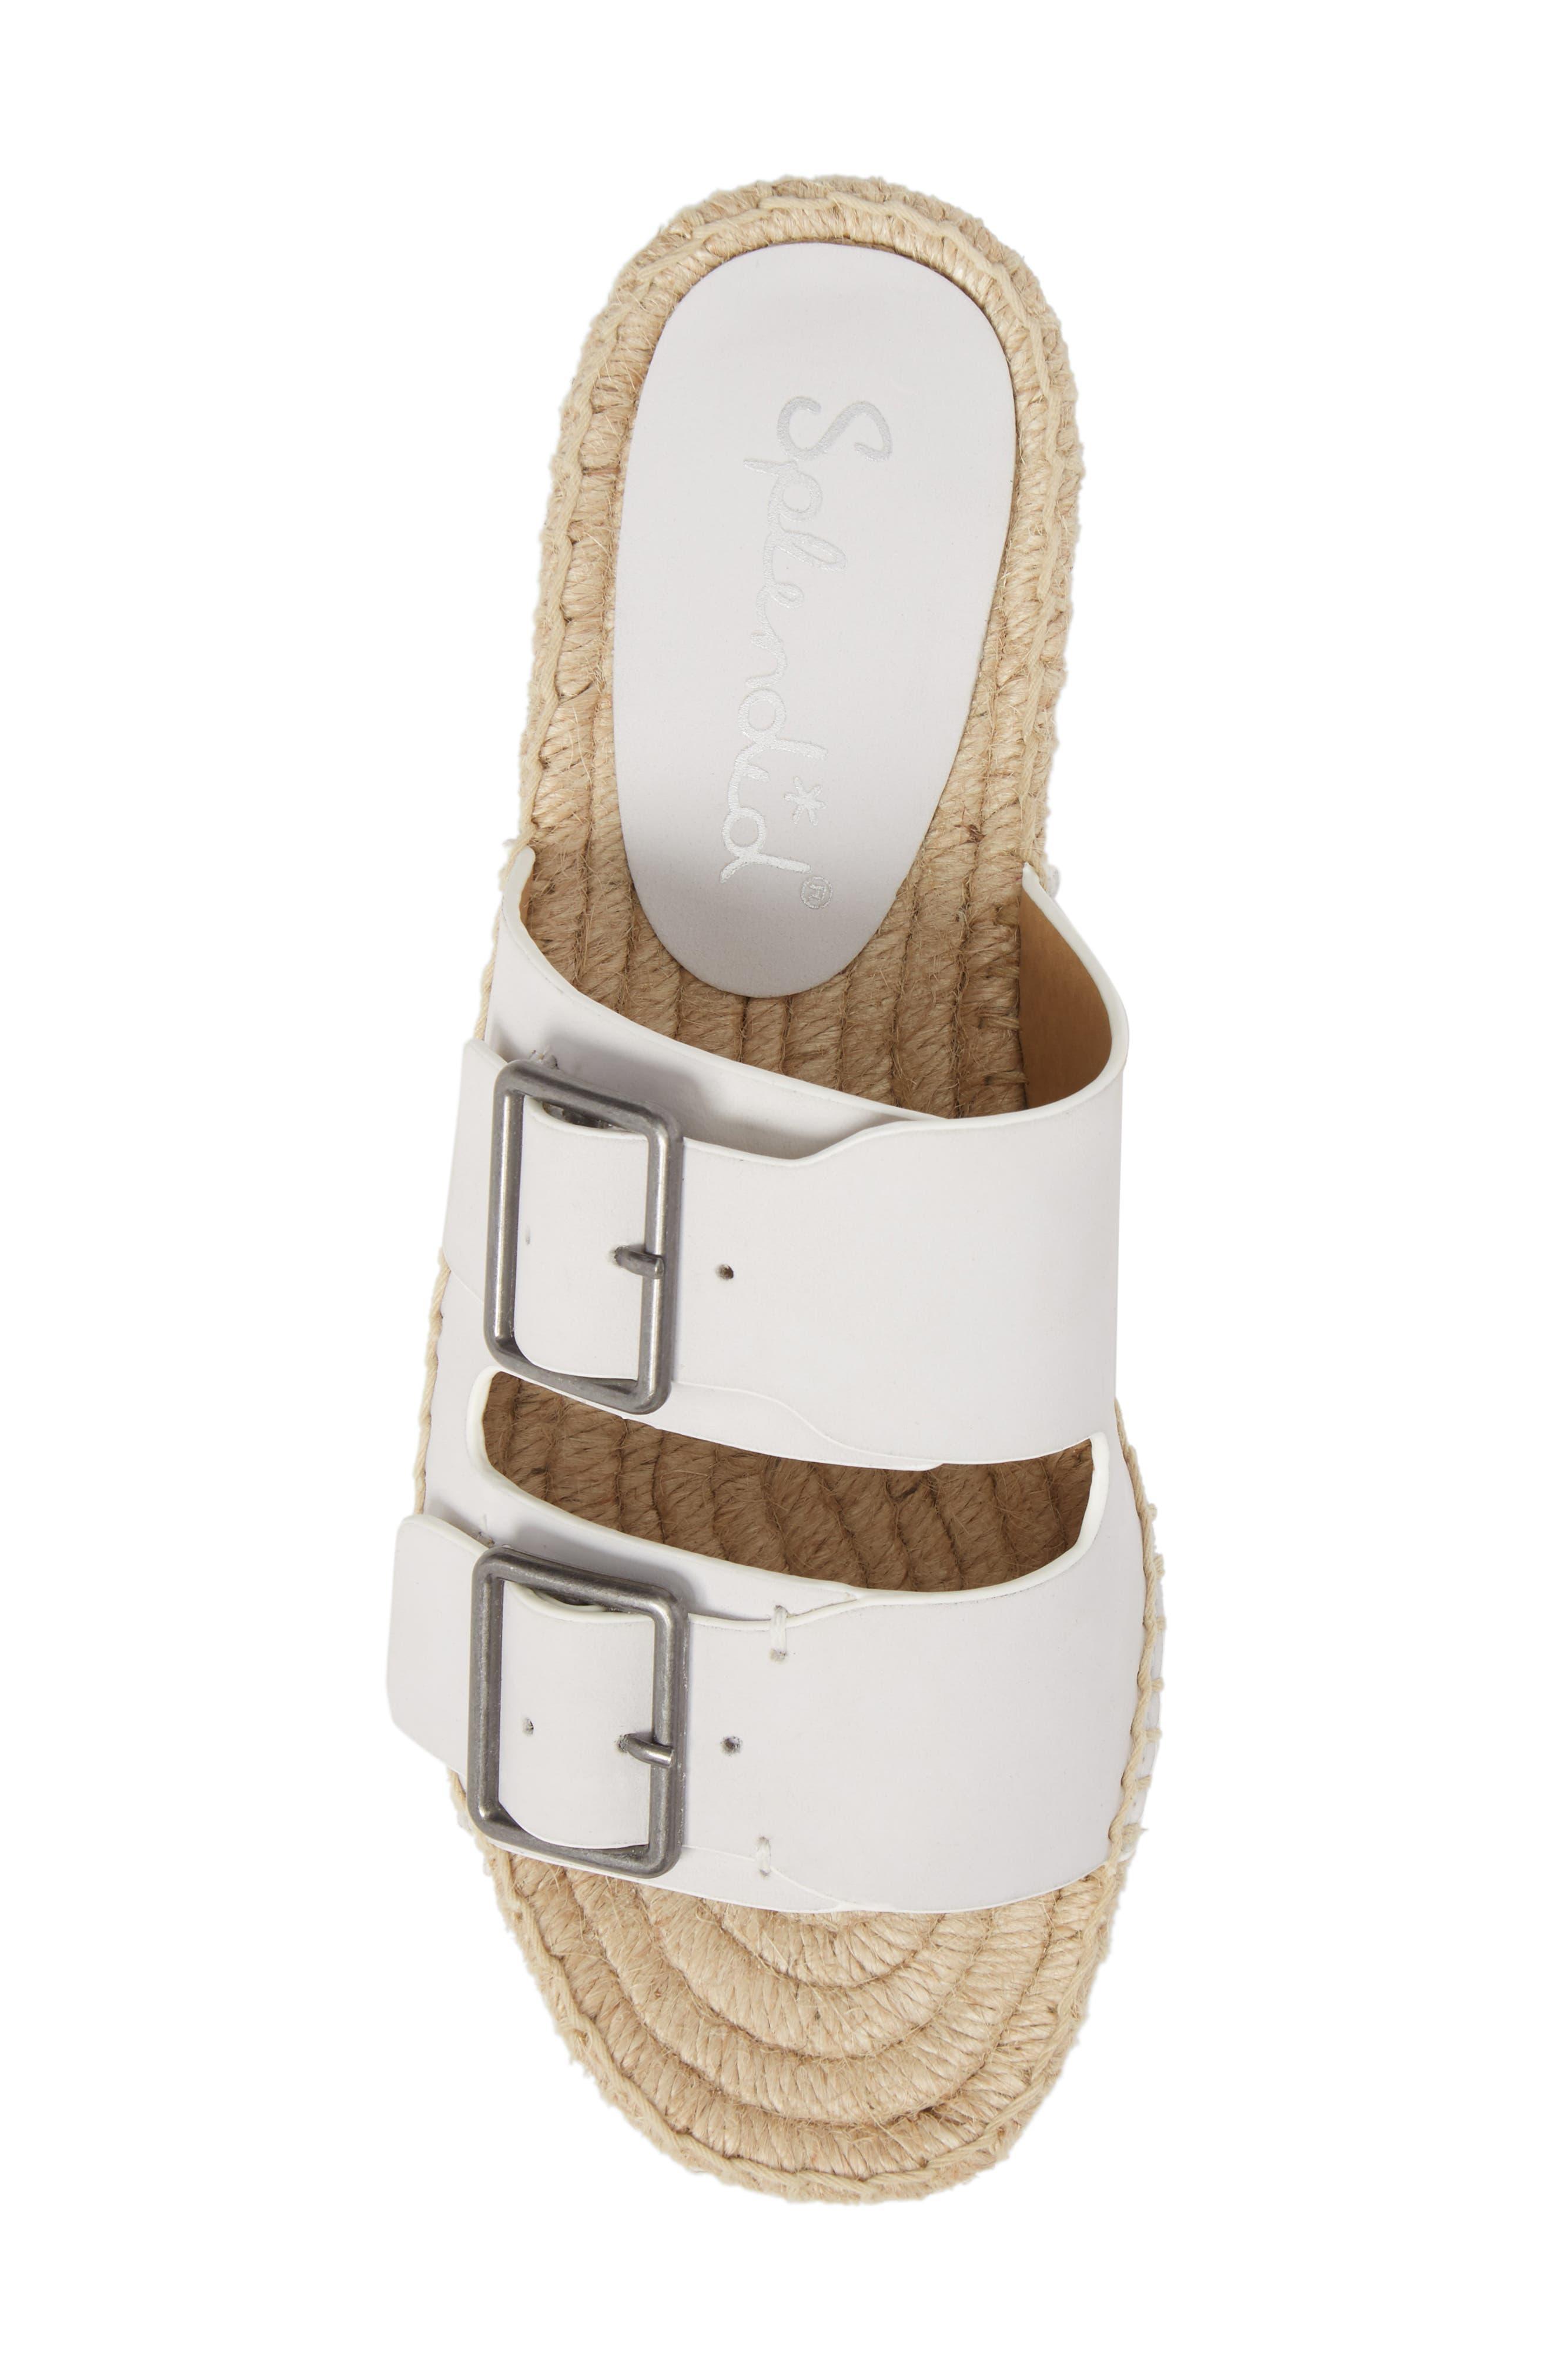 Blake Buckle Espadrille Sandal,                             Alternate thumbnail 5, color,                             White Leather